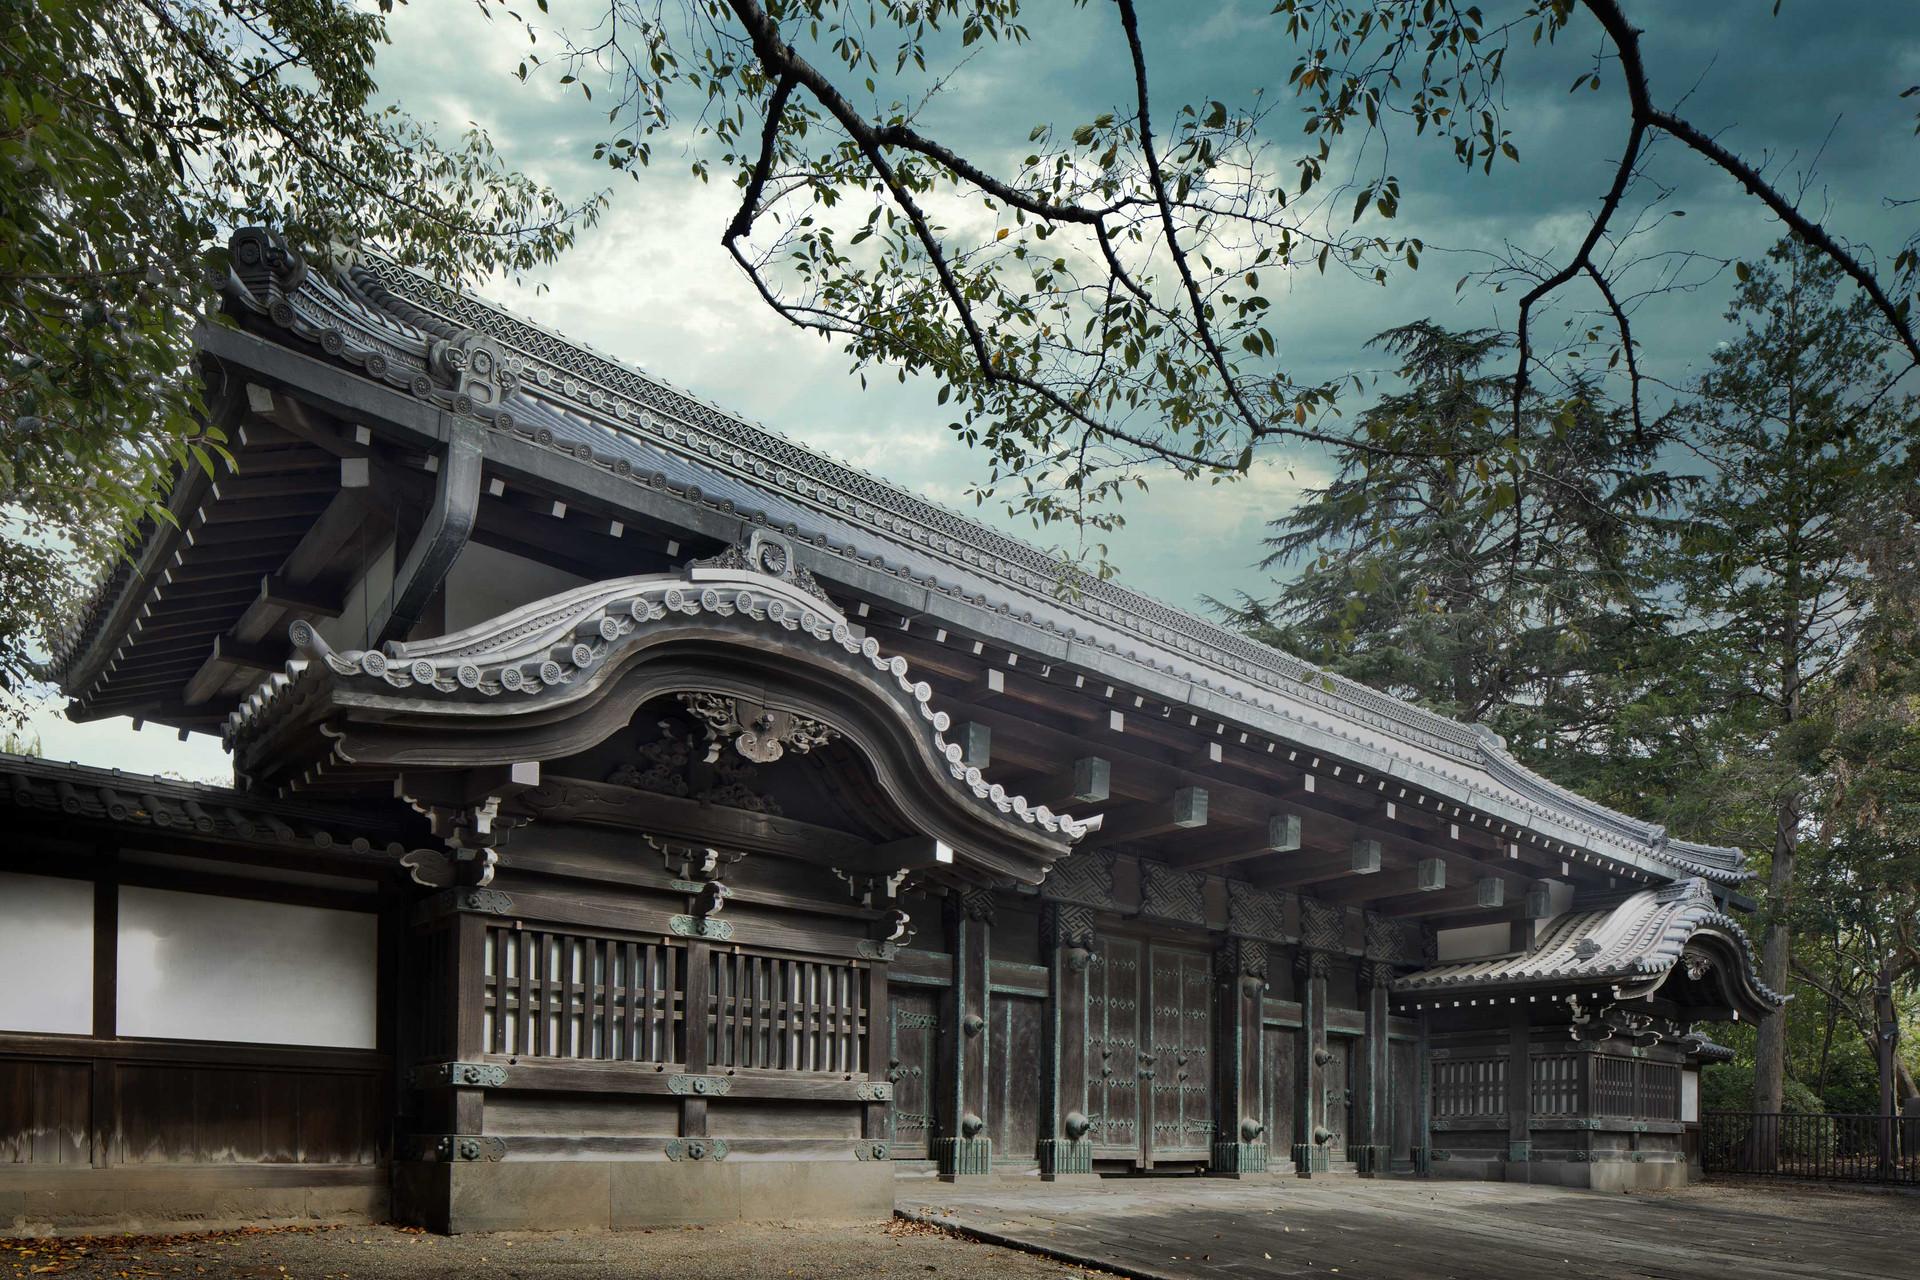 Kuromon Gate of the Inshu-Ikeda Residence